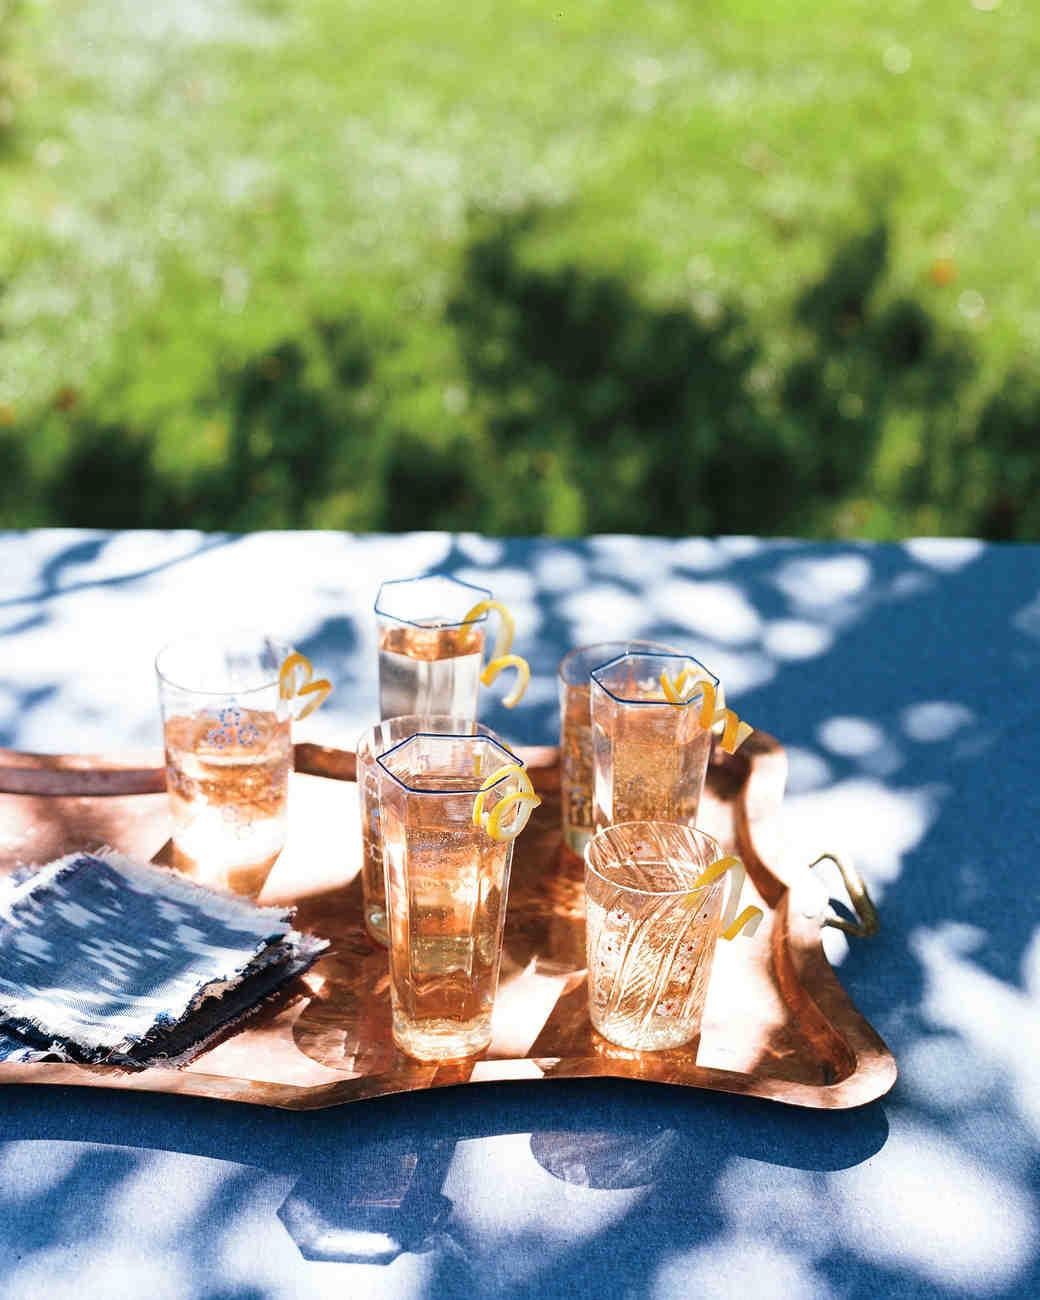 mfiona-peter-wedding-vermont-cocktails-9623.06.2015.47-d112512.jpg